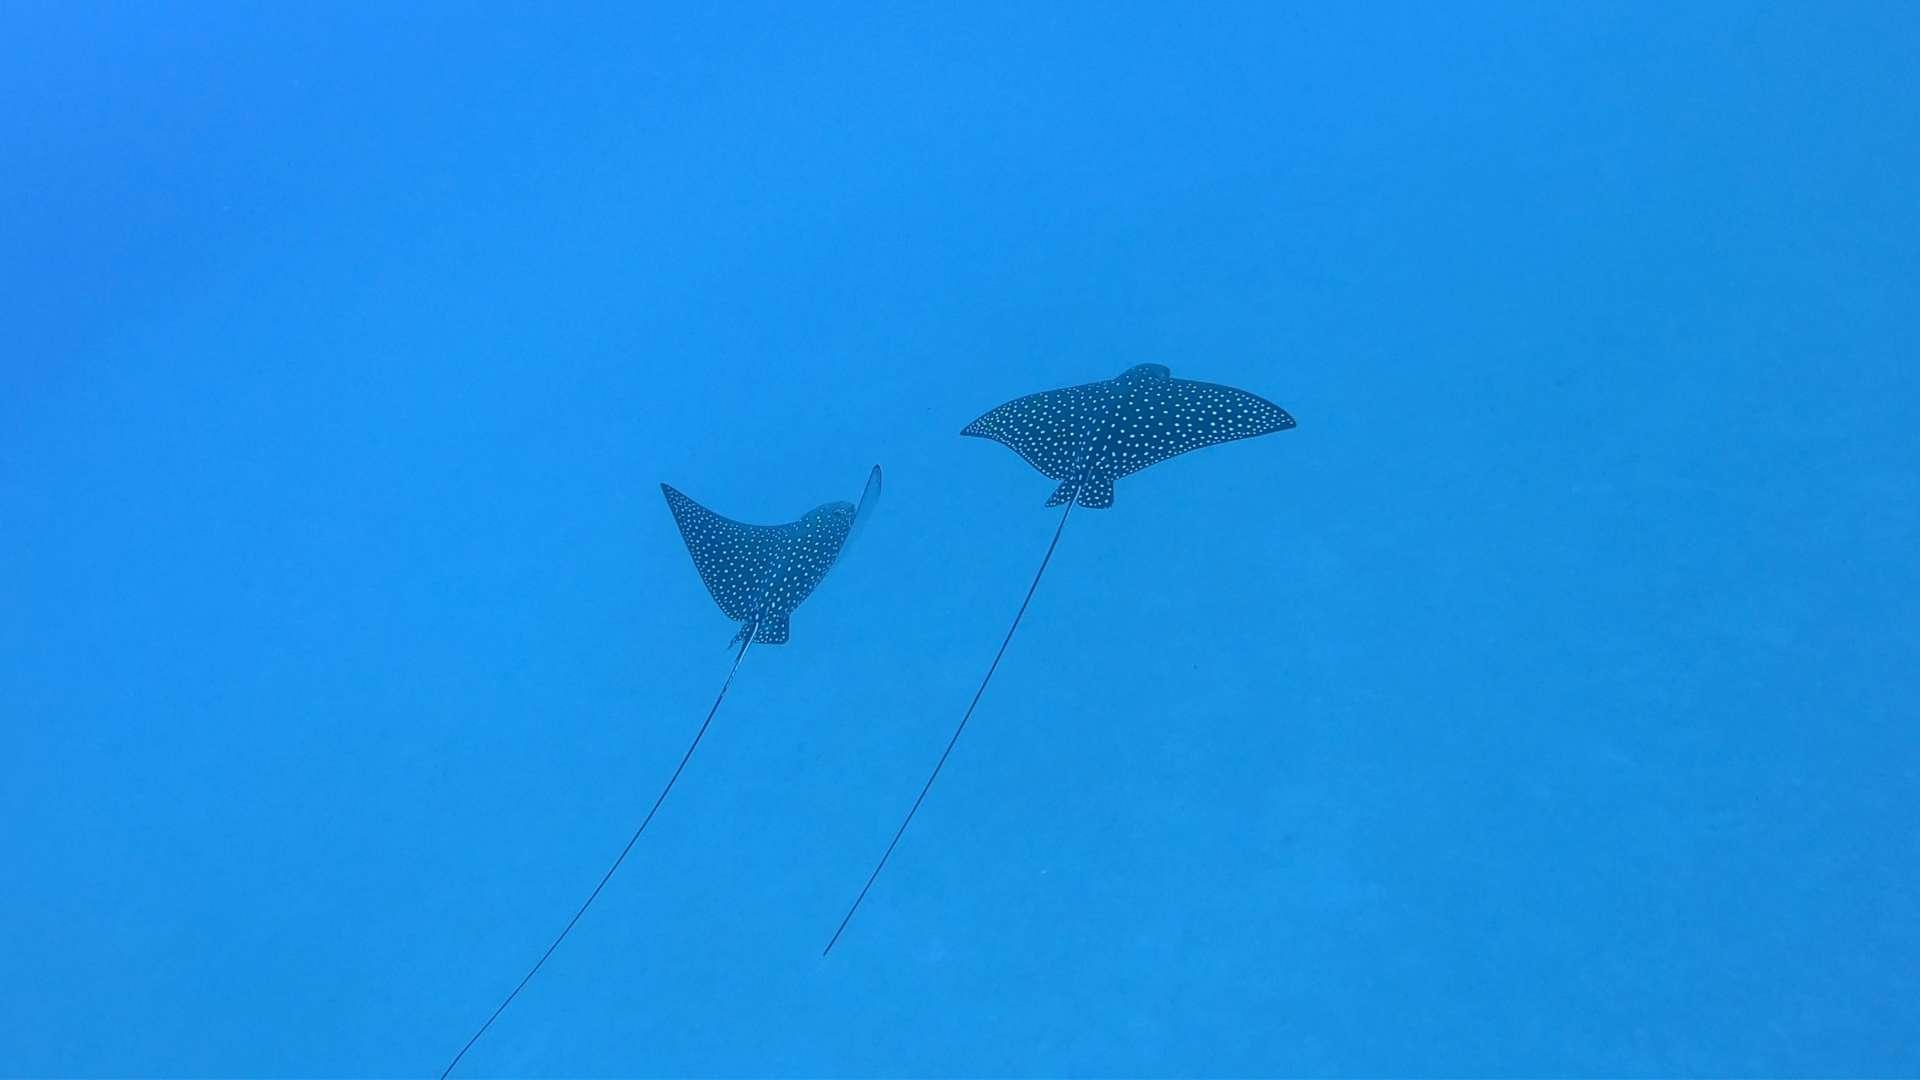 Hawaii scuba - 04-14-2019